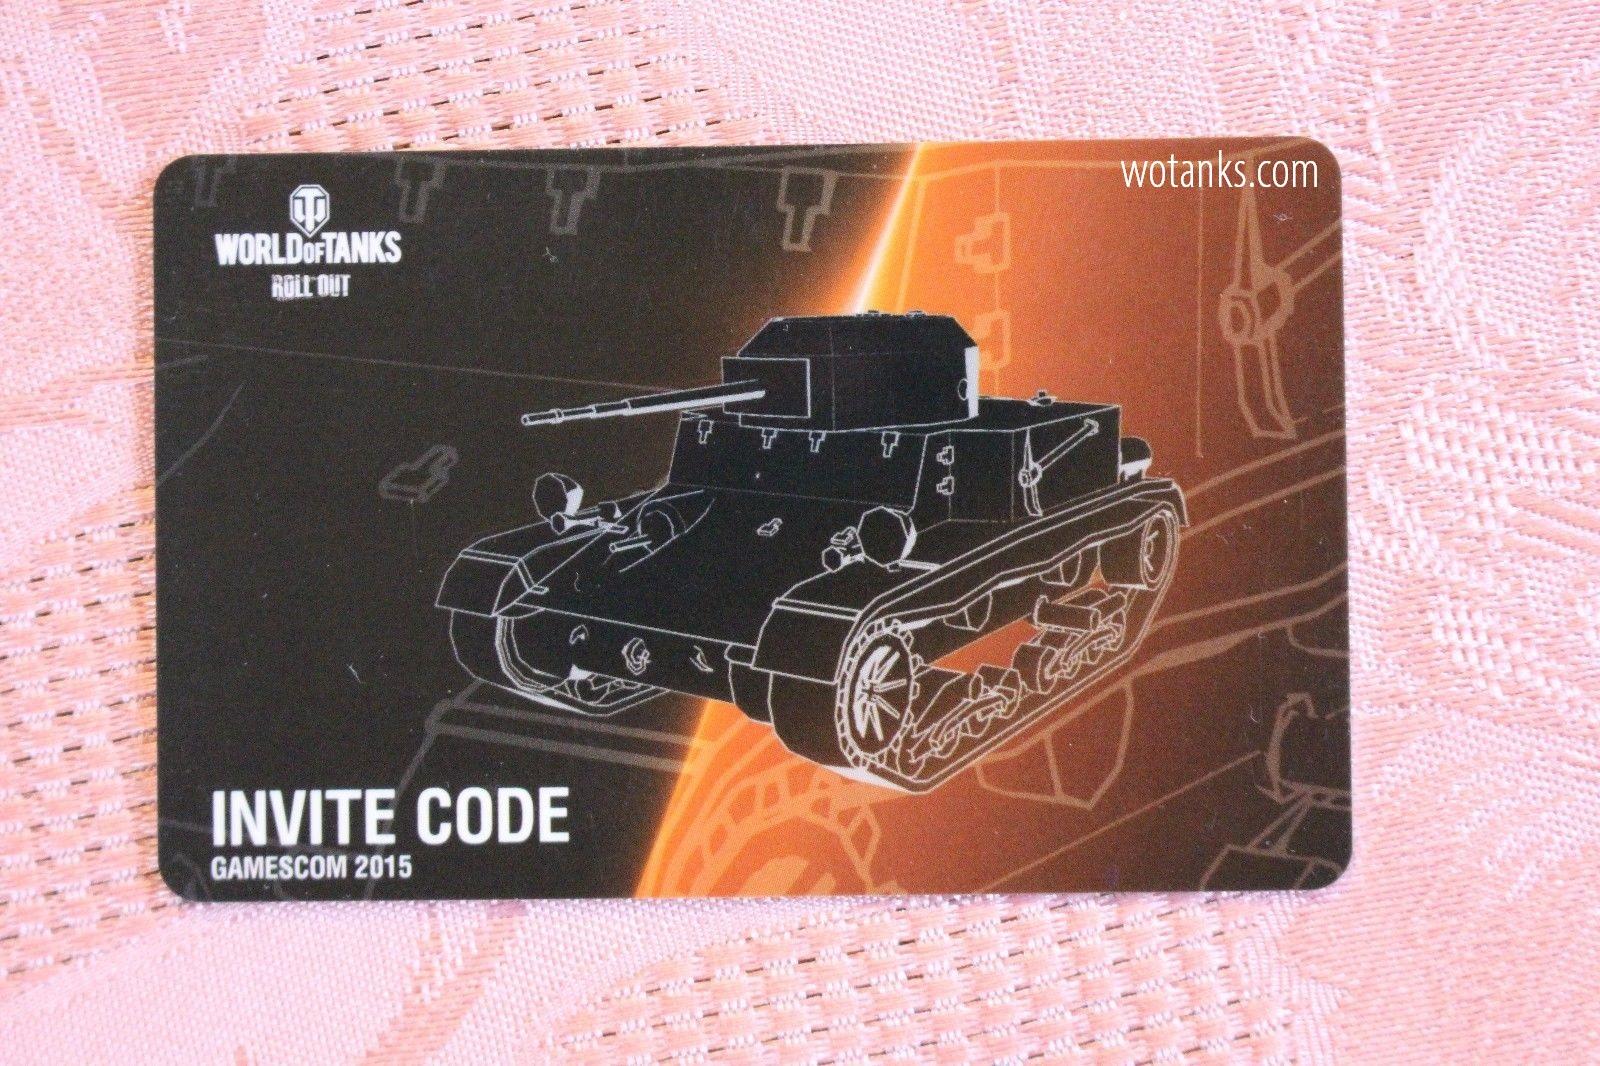 бесплатно бонус код для world of tanks на 2015